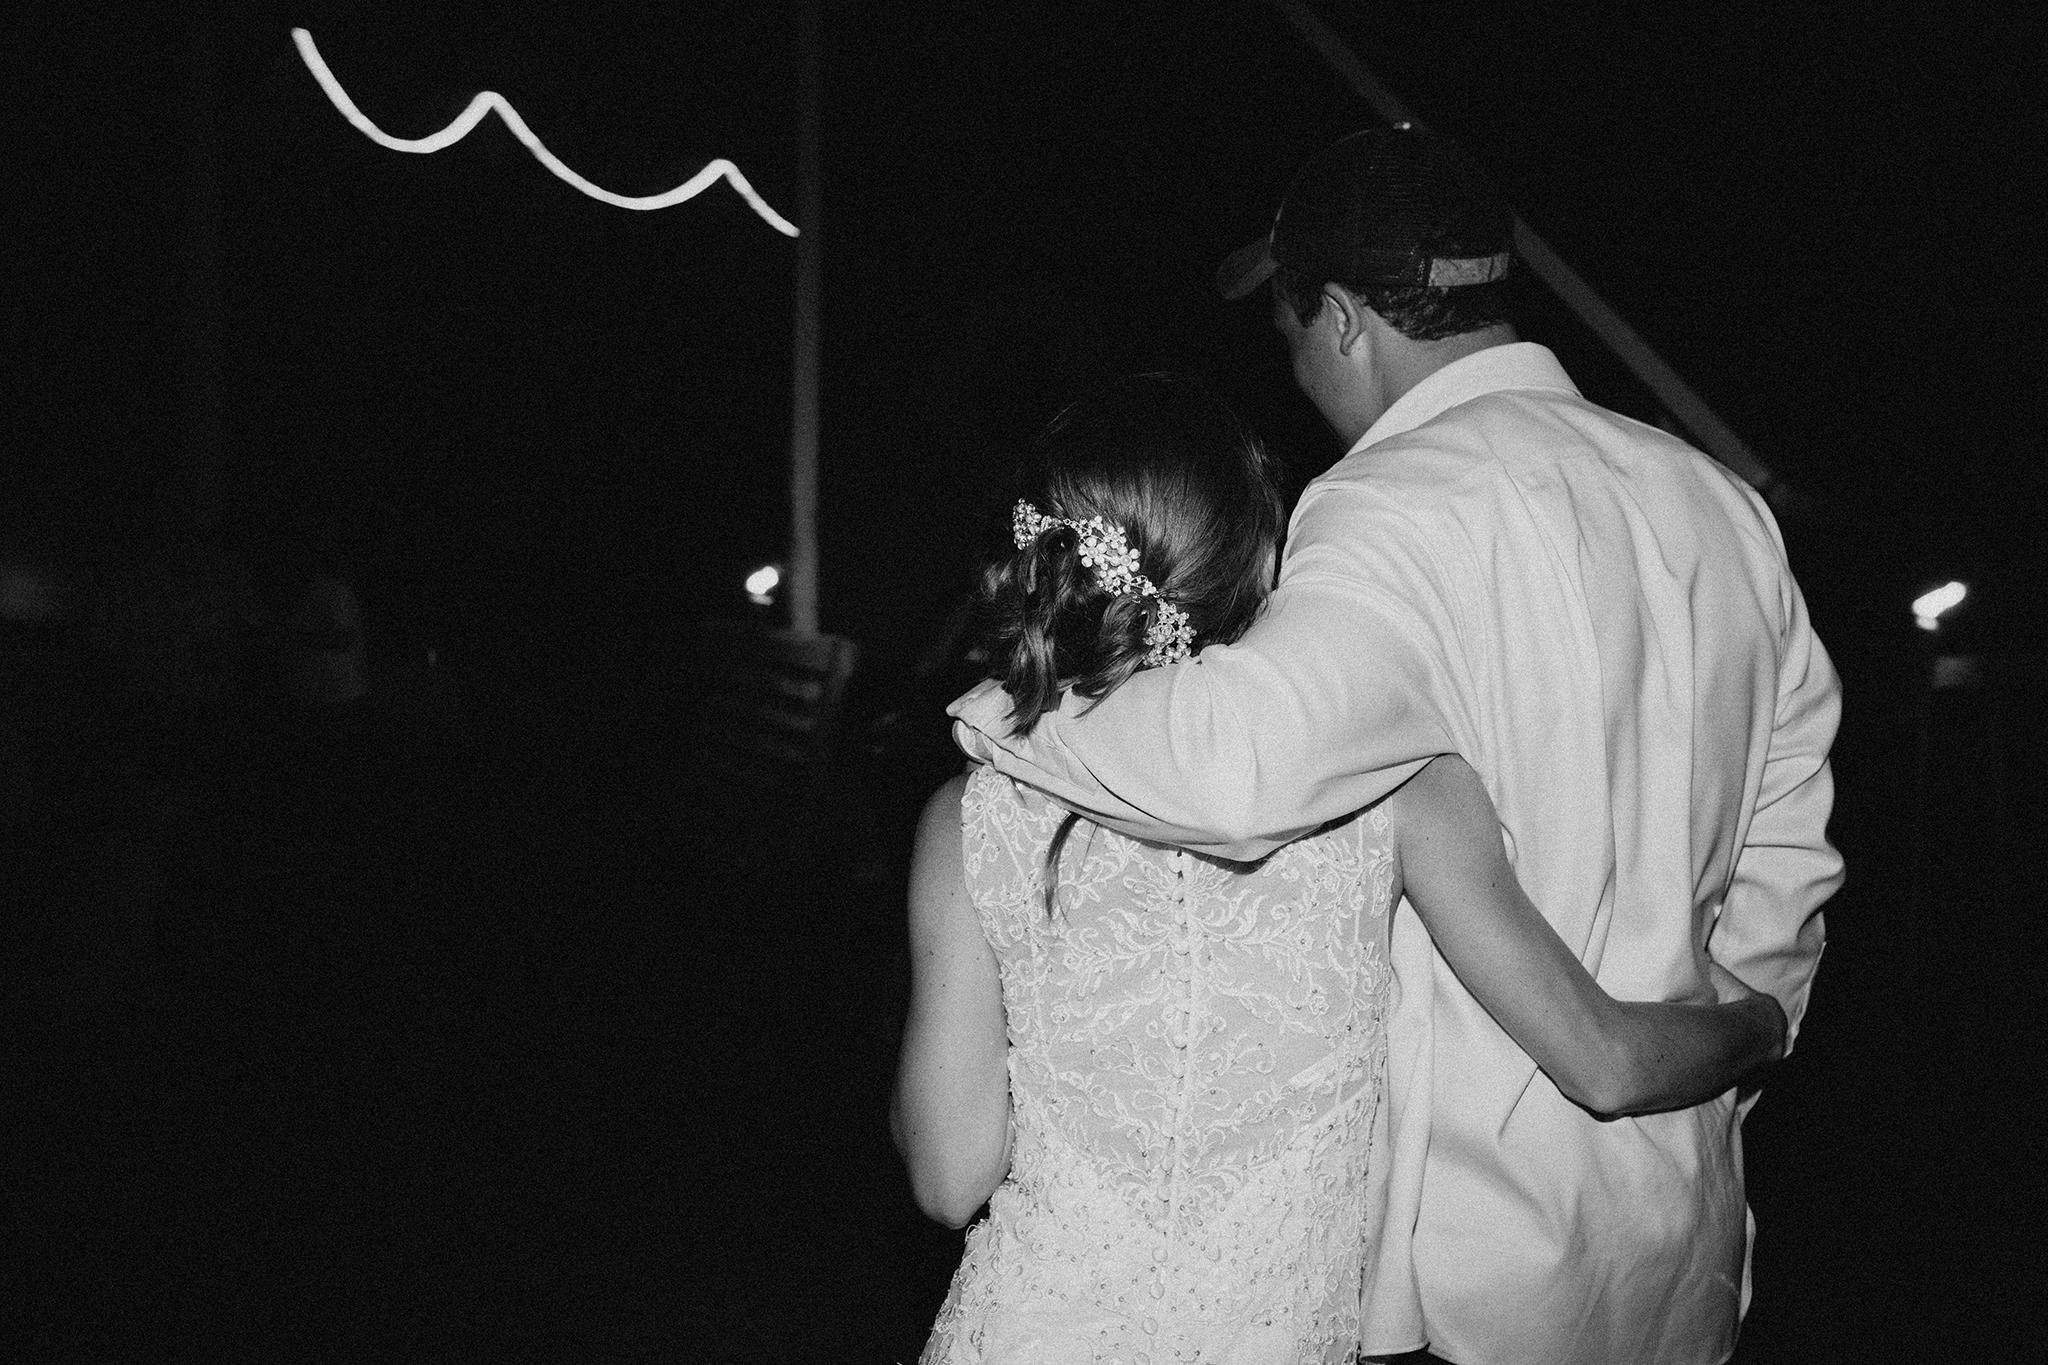 vermont-wedding-photographer-outdoor-farm-wedding-101.jpg